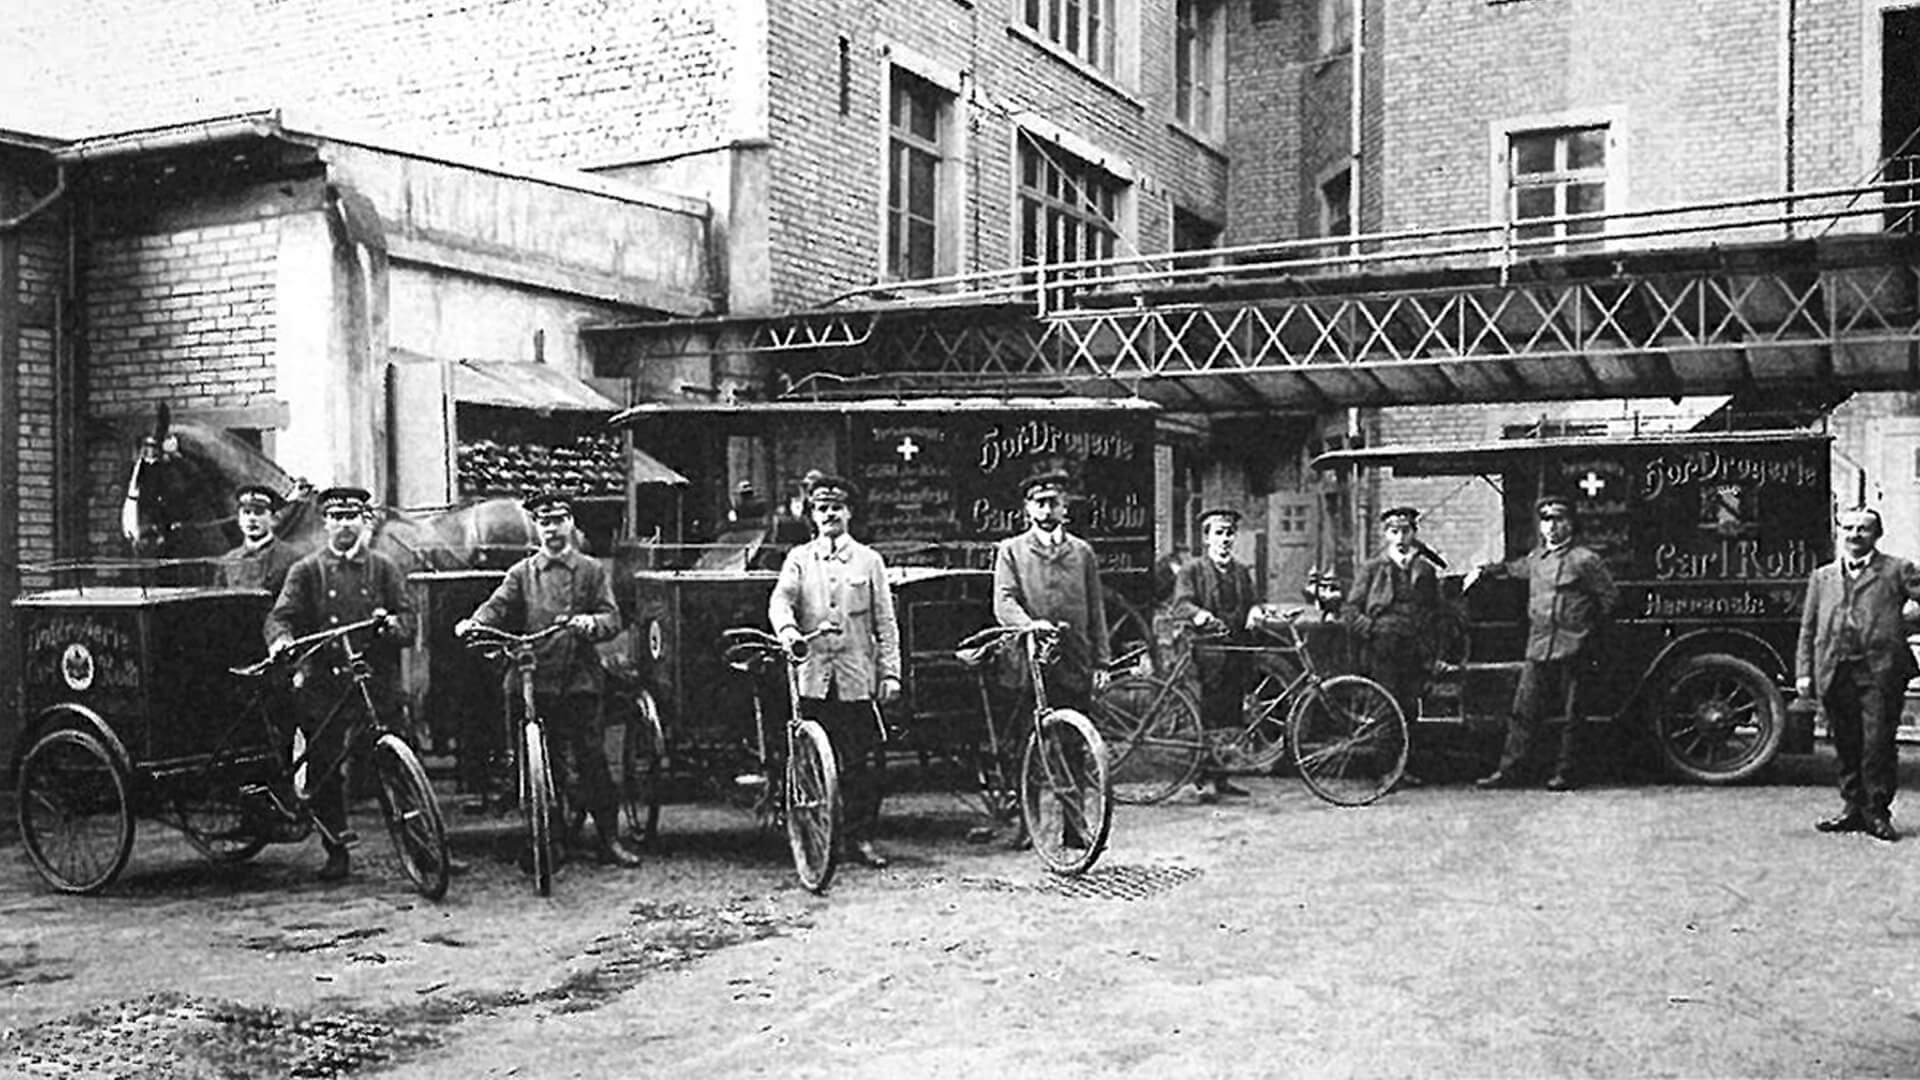 Carl-Roth-Furhpark-Pferdefuhrwerk-Dreiräder